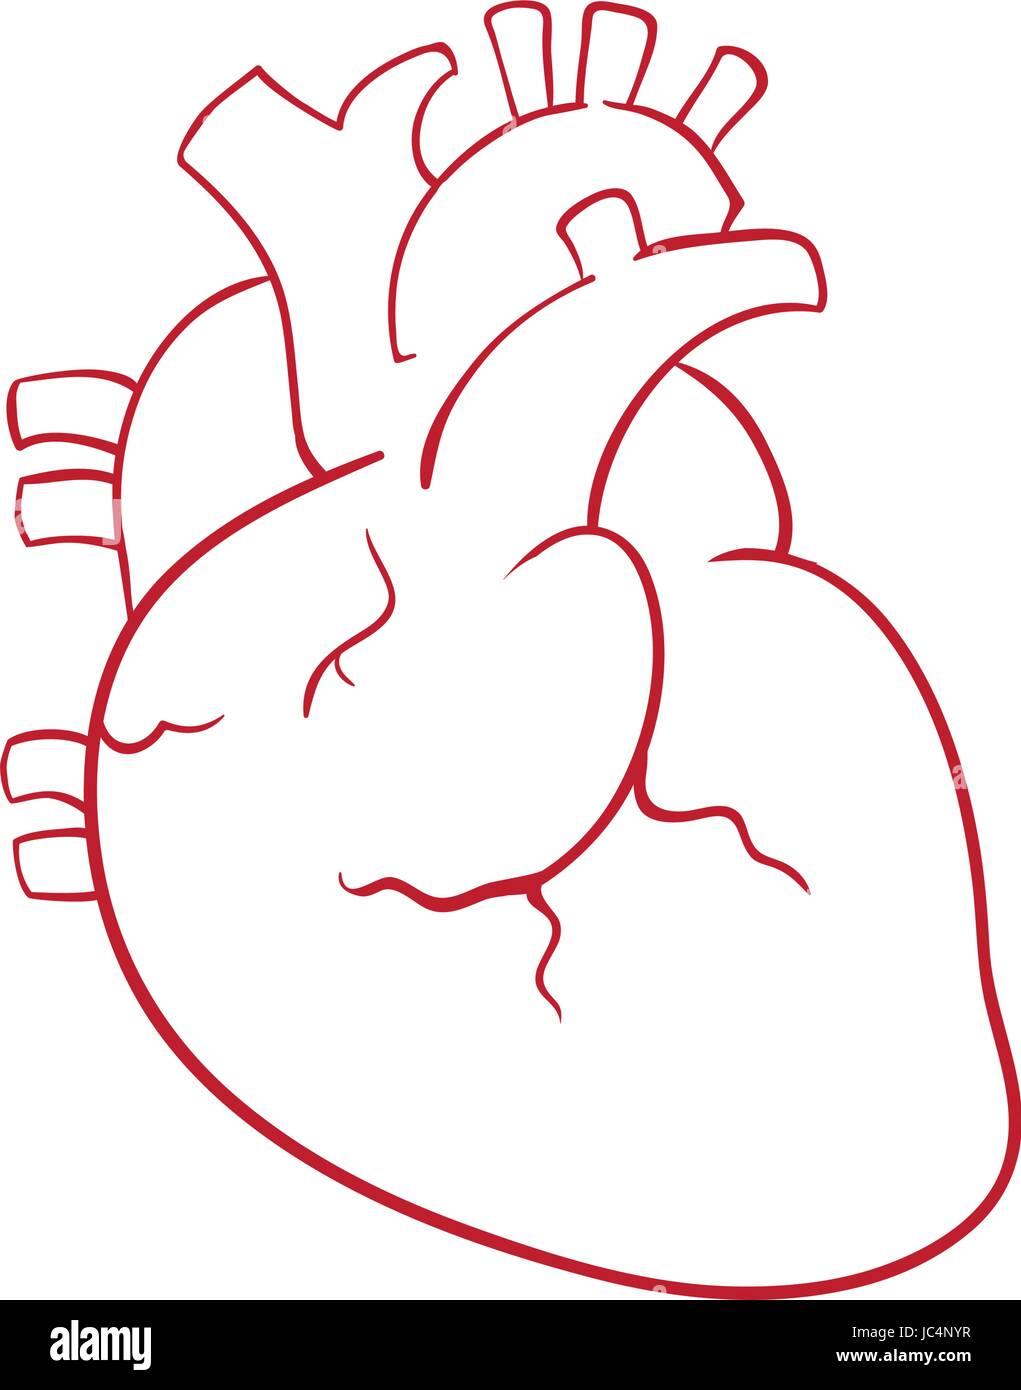 heart human anatomy engraving stockfotos heart human anatomy engraving bilder alamy. Black Bedroom Furniture Sets. Home Design Ideas